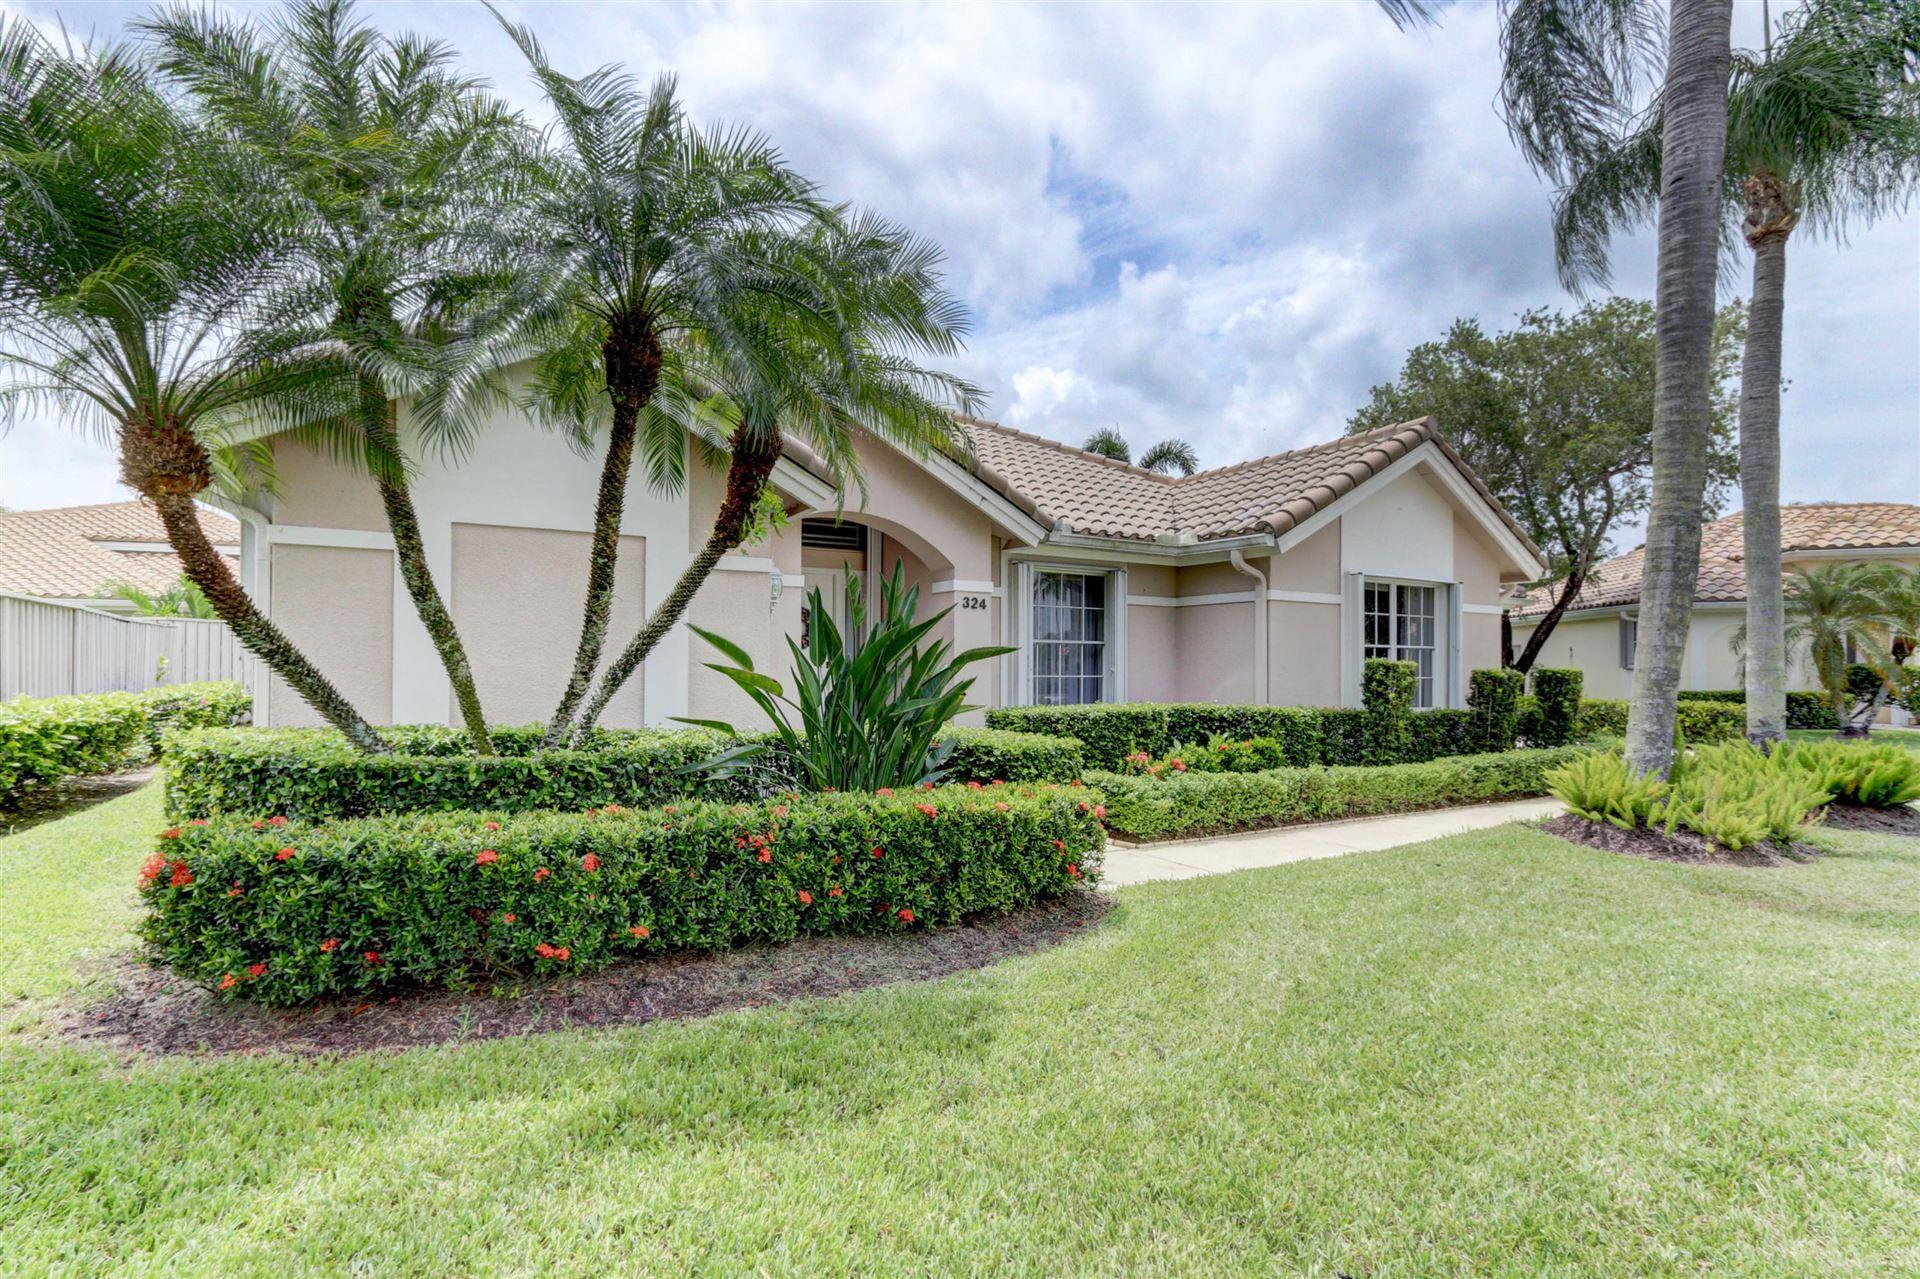 324 Eagleton Golf Drive, Palm Beach Gardens, FL 33418 - #: RX-10649023